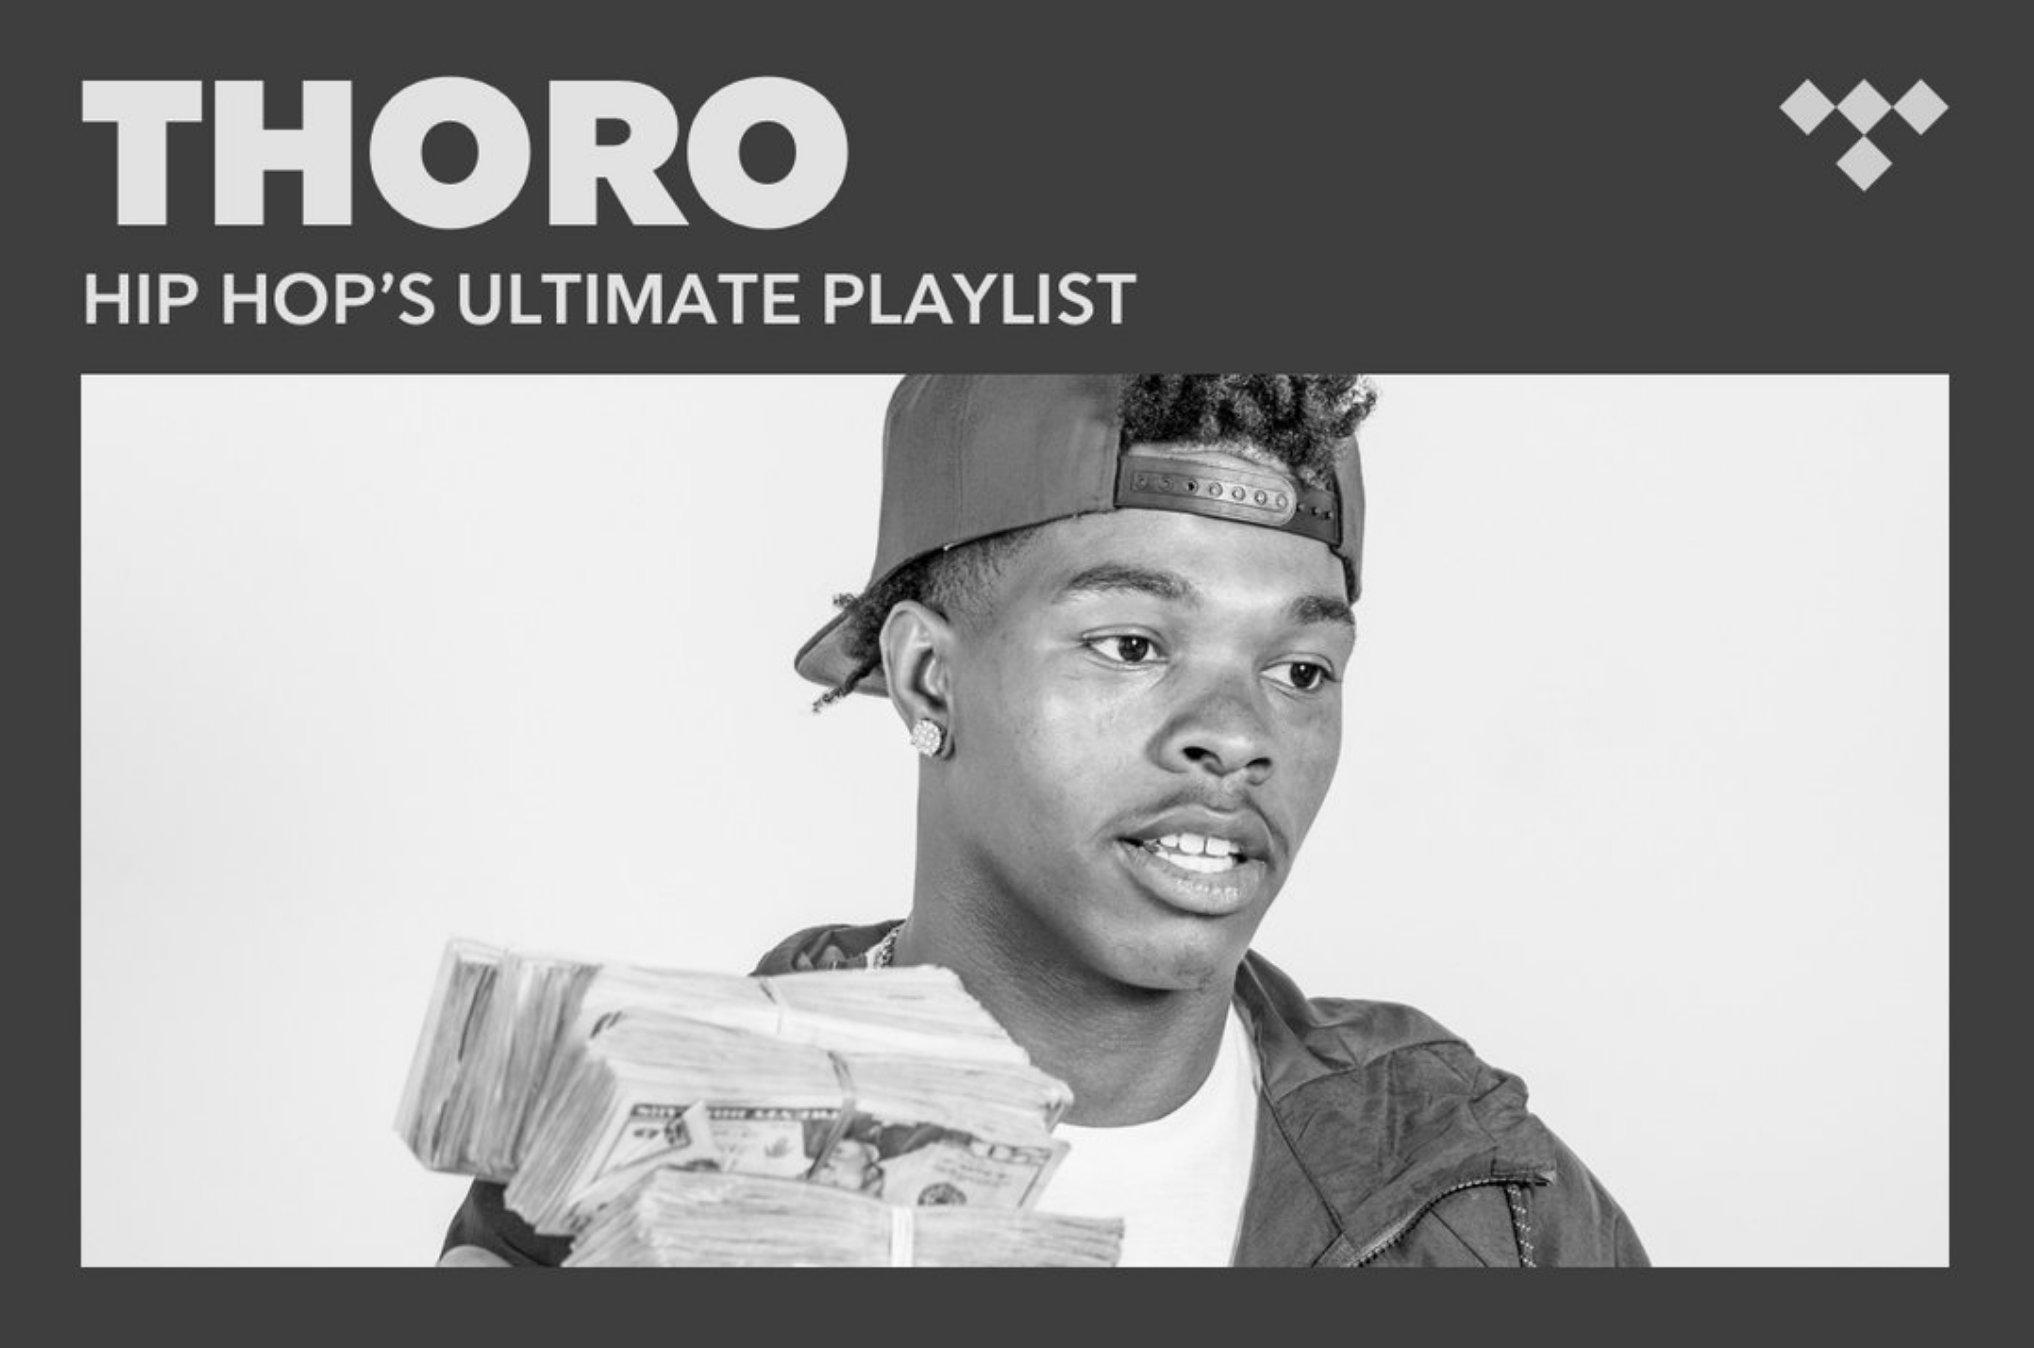 #Thoro Hip Hop's Ultimate Playlist https://t.co/ZYQ2uPMg8d #TIDAL https://t.co/vYTt40UMeo